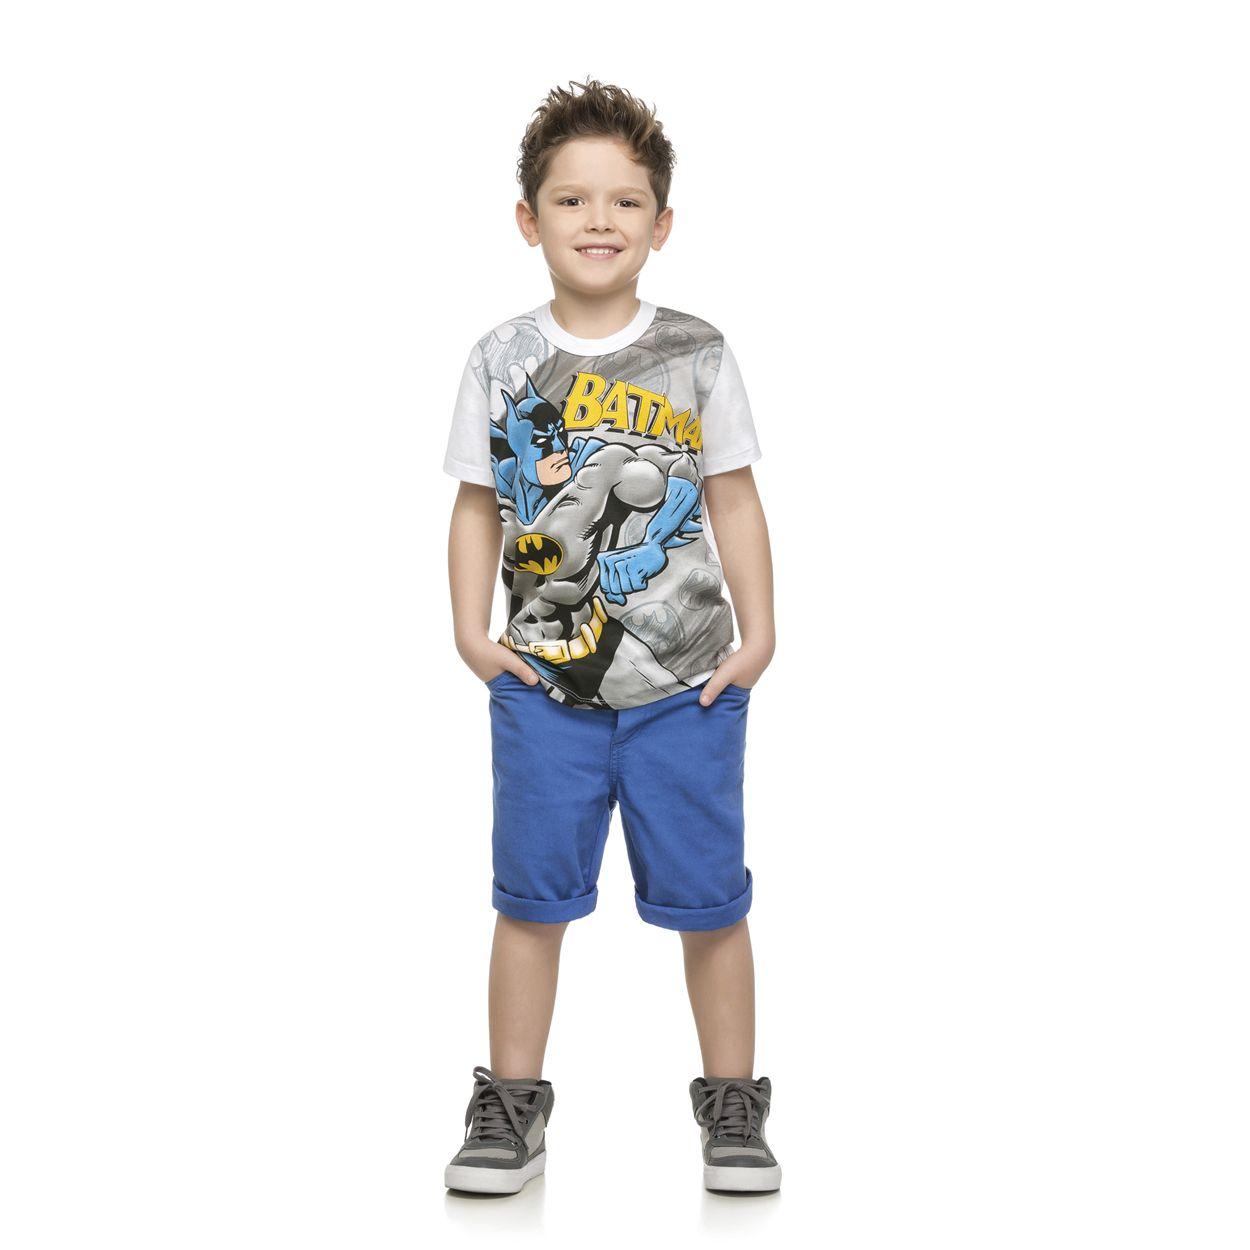 Camiseta infantil do Batman REF.82006